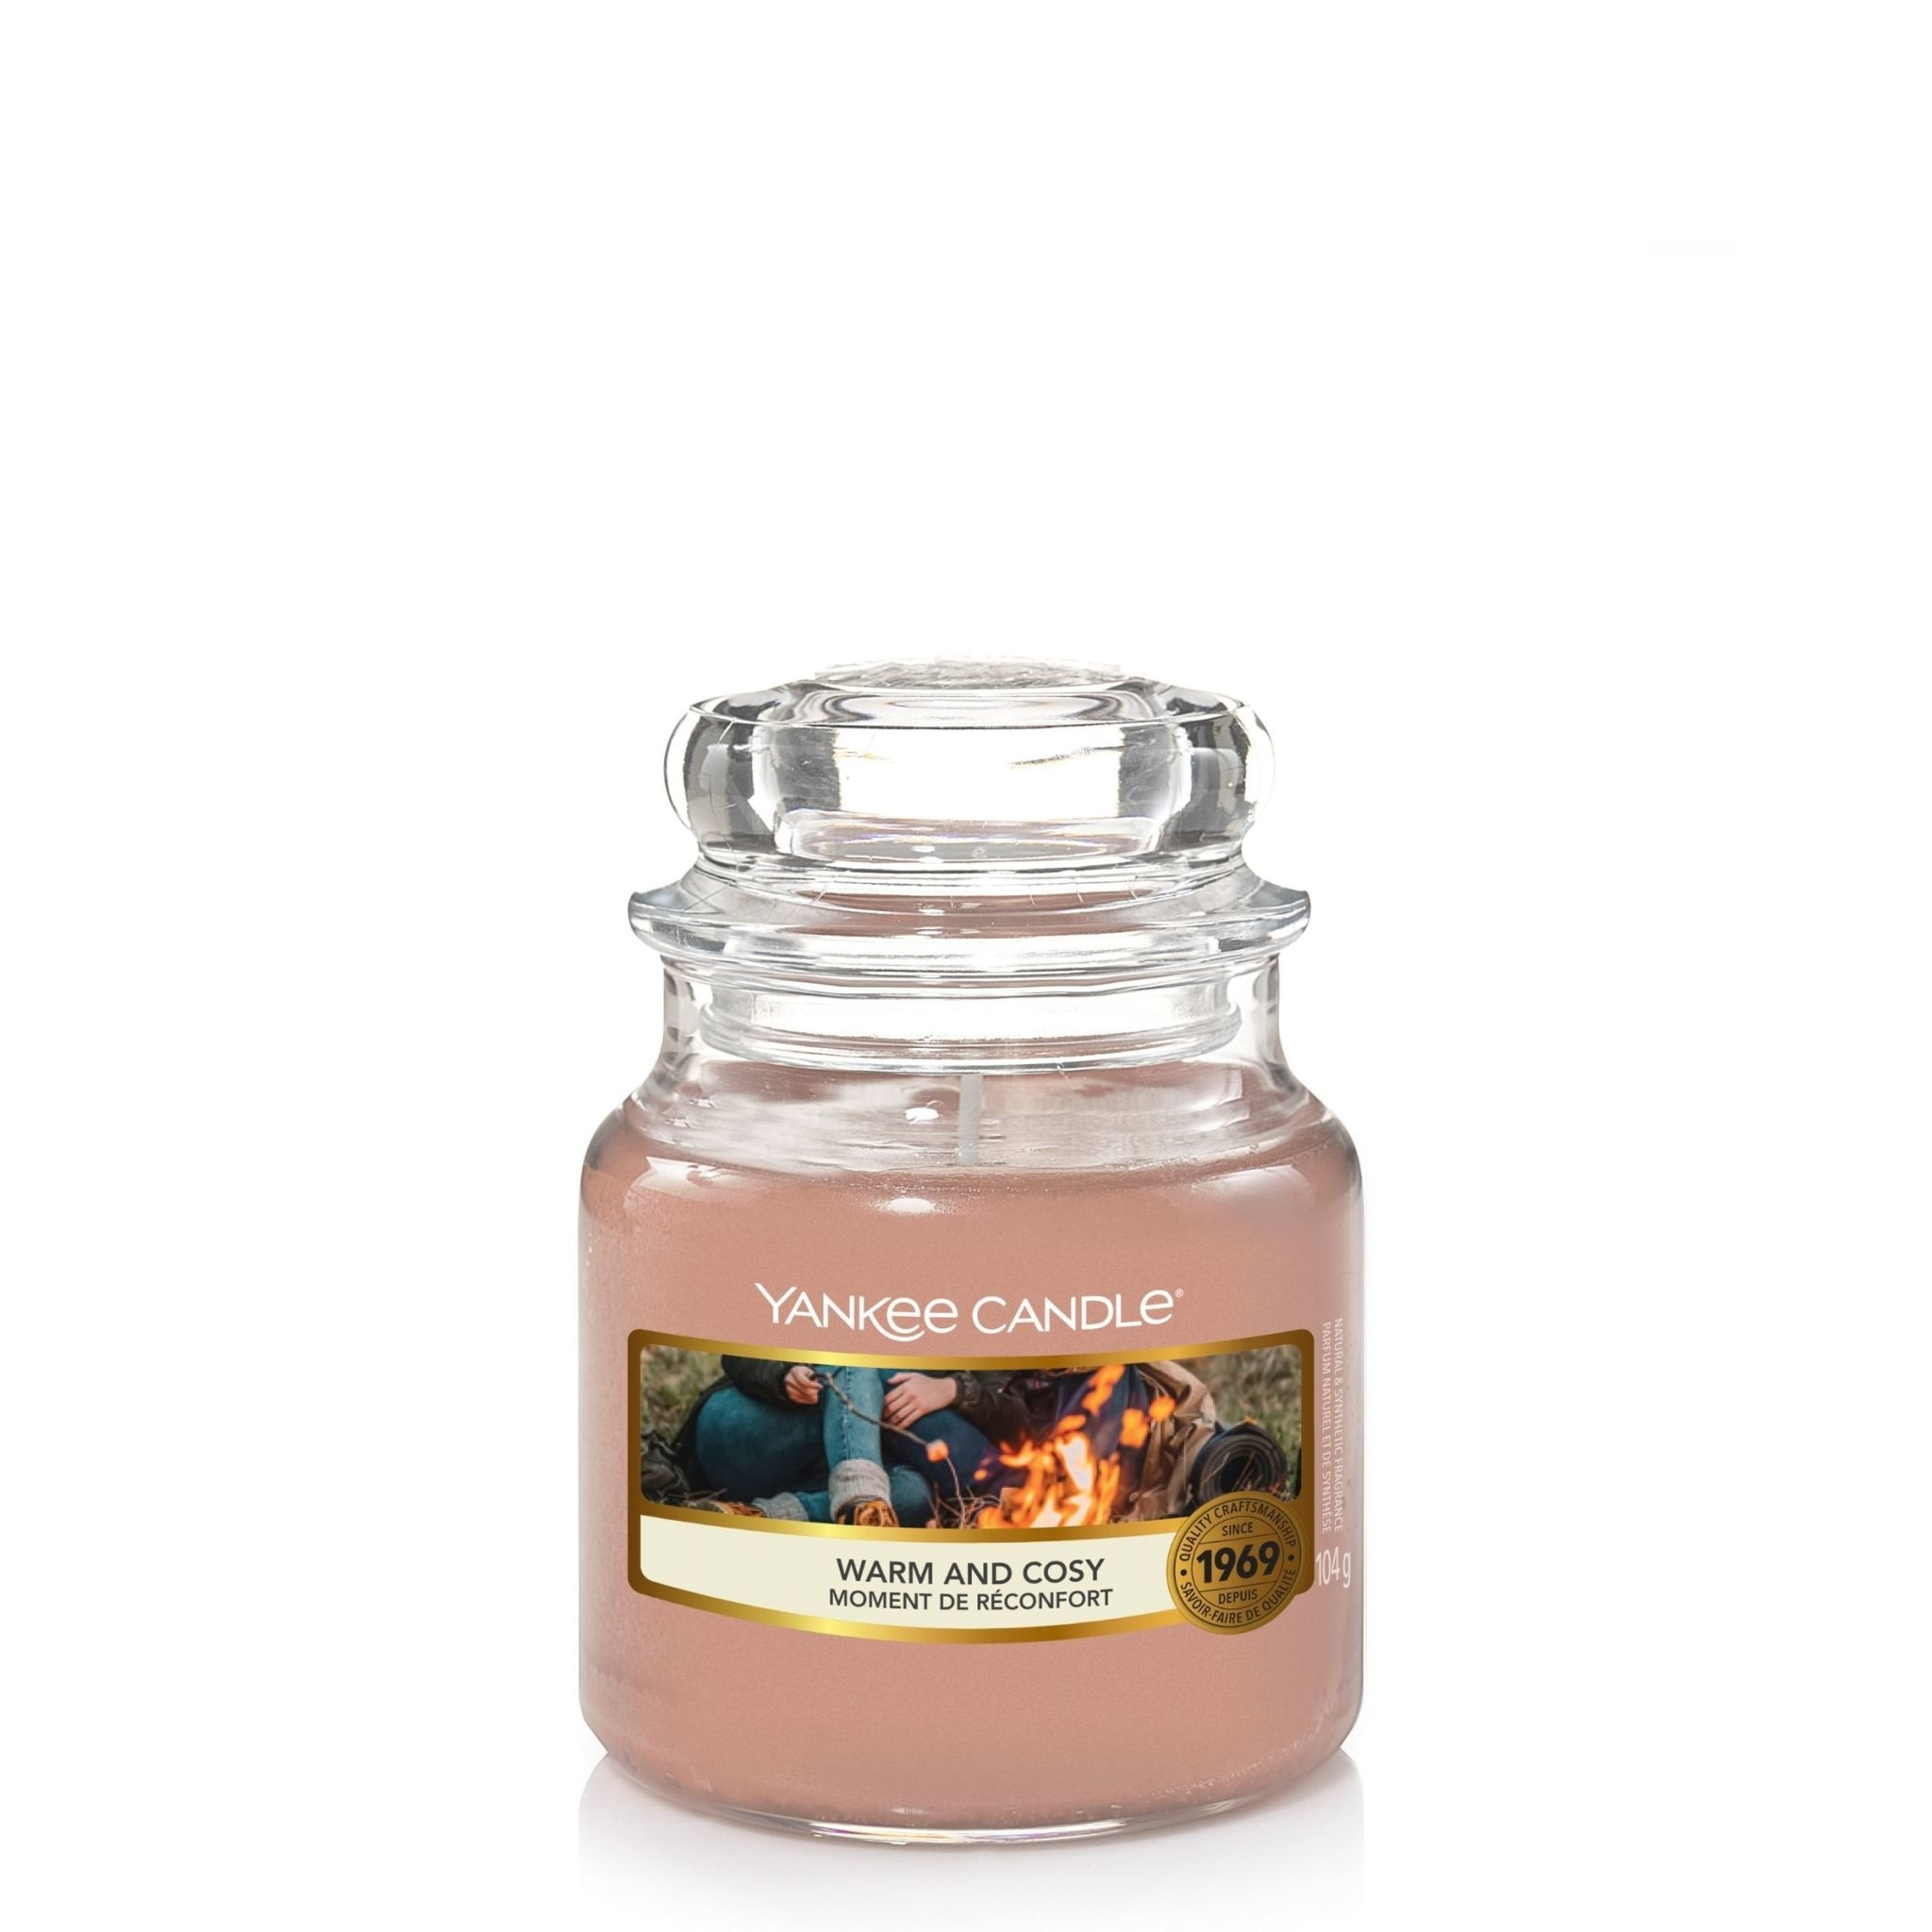 Yankee Candle Warm & Cosy - Small Jar